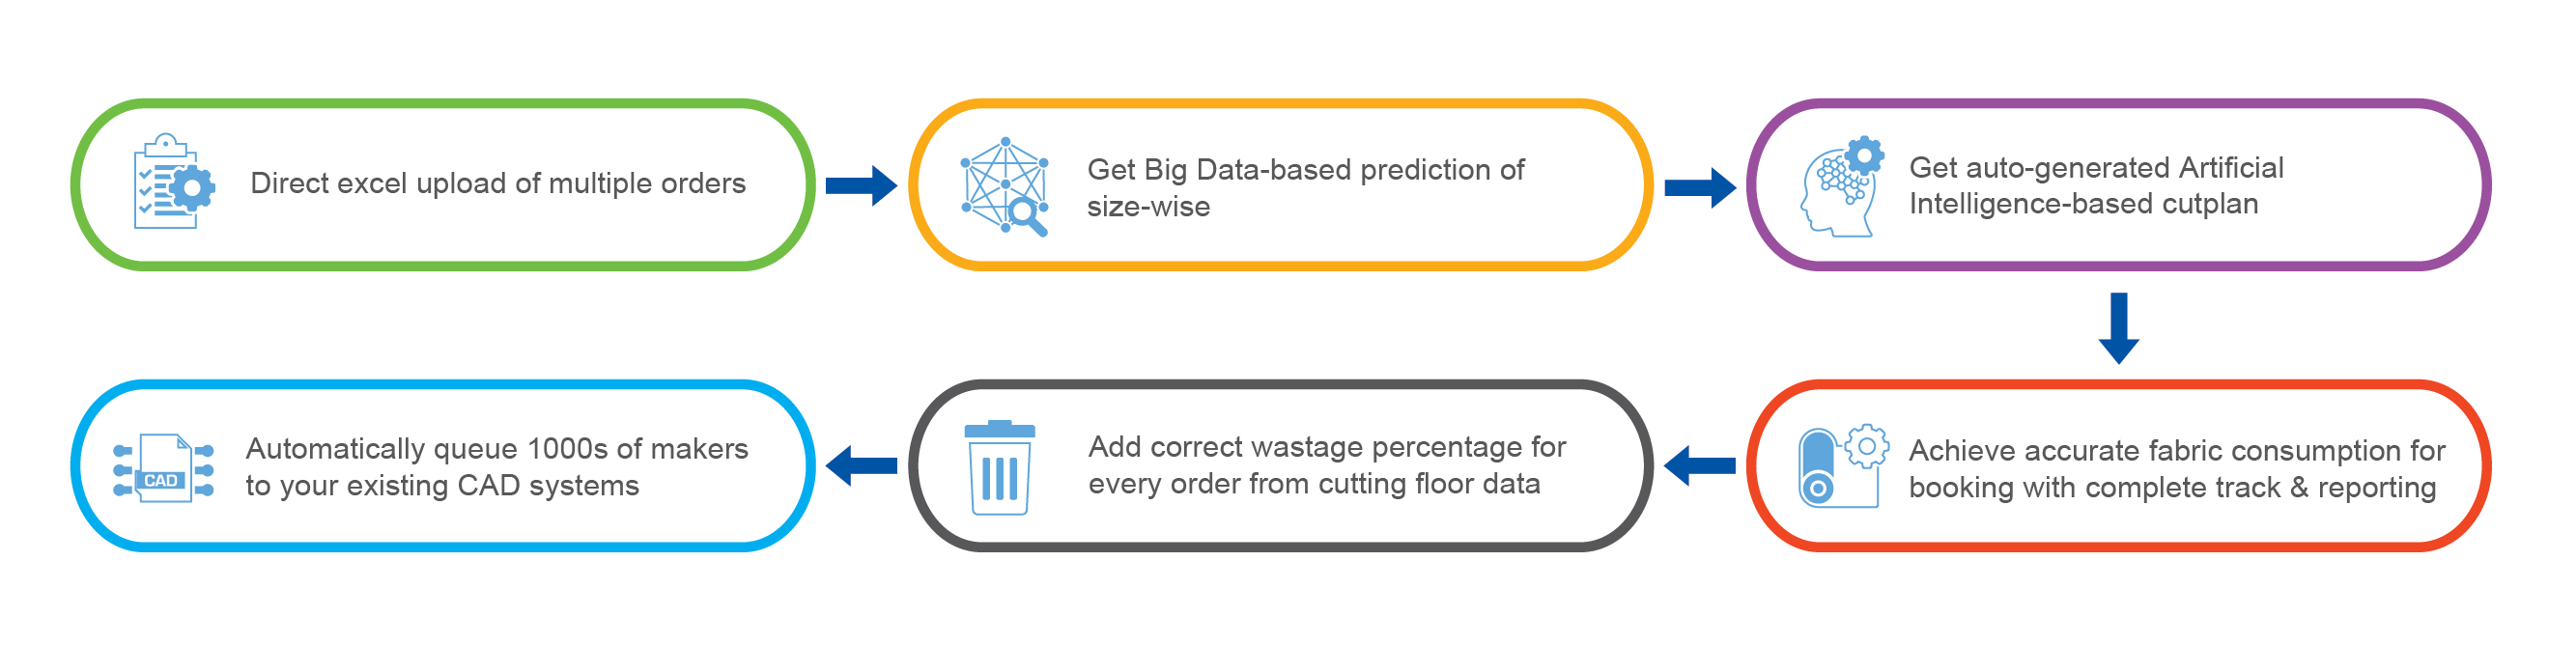 IntelloBuy Process Flow